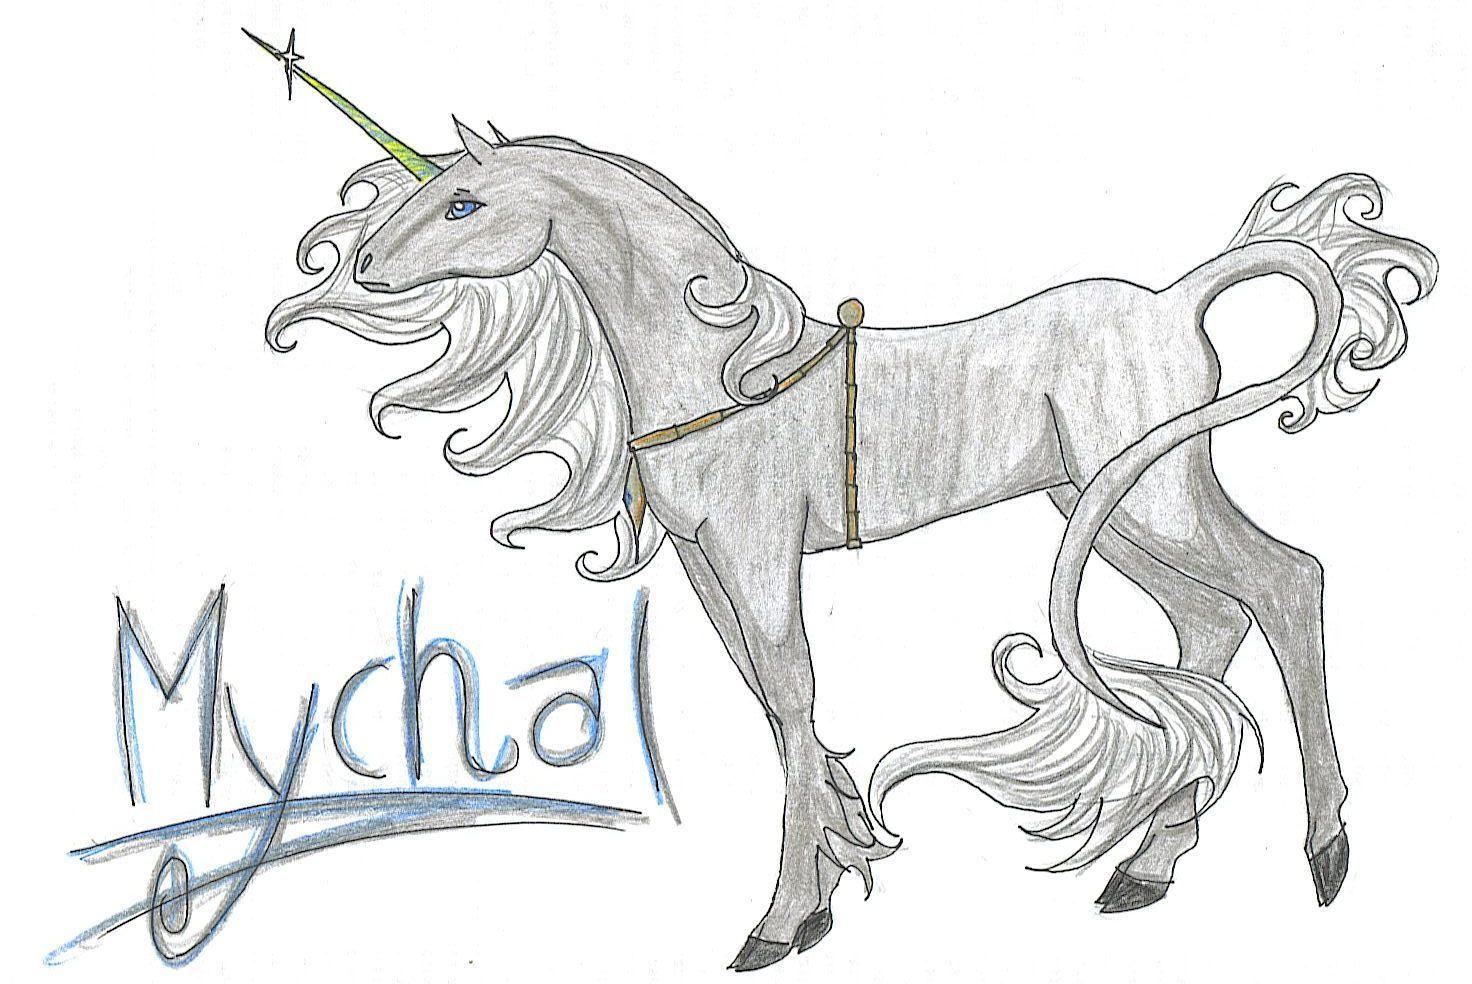 Mychal:Mother of BladeRunner by Bladerunner